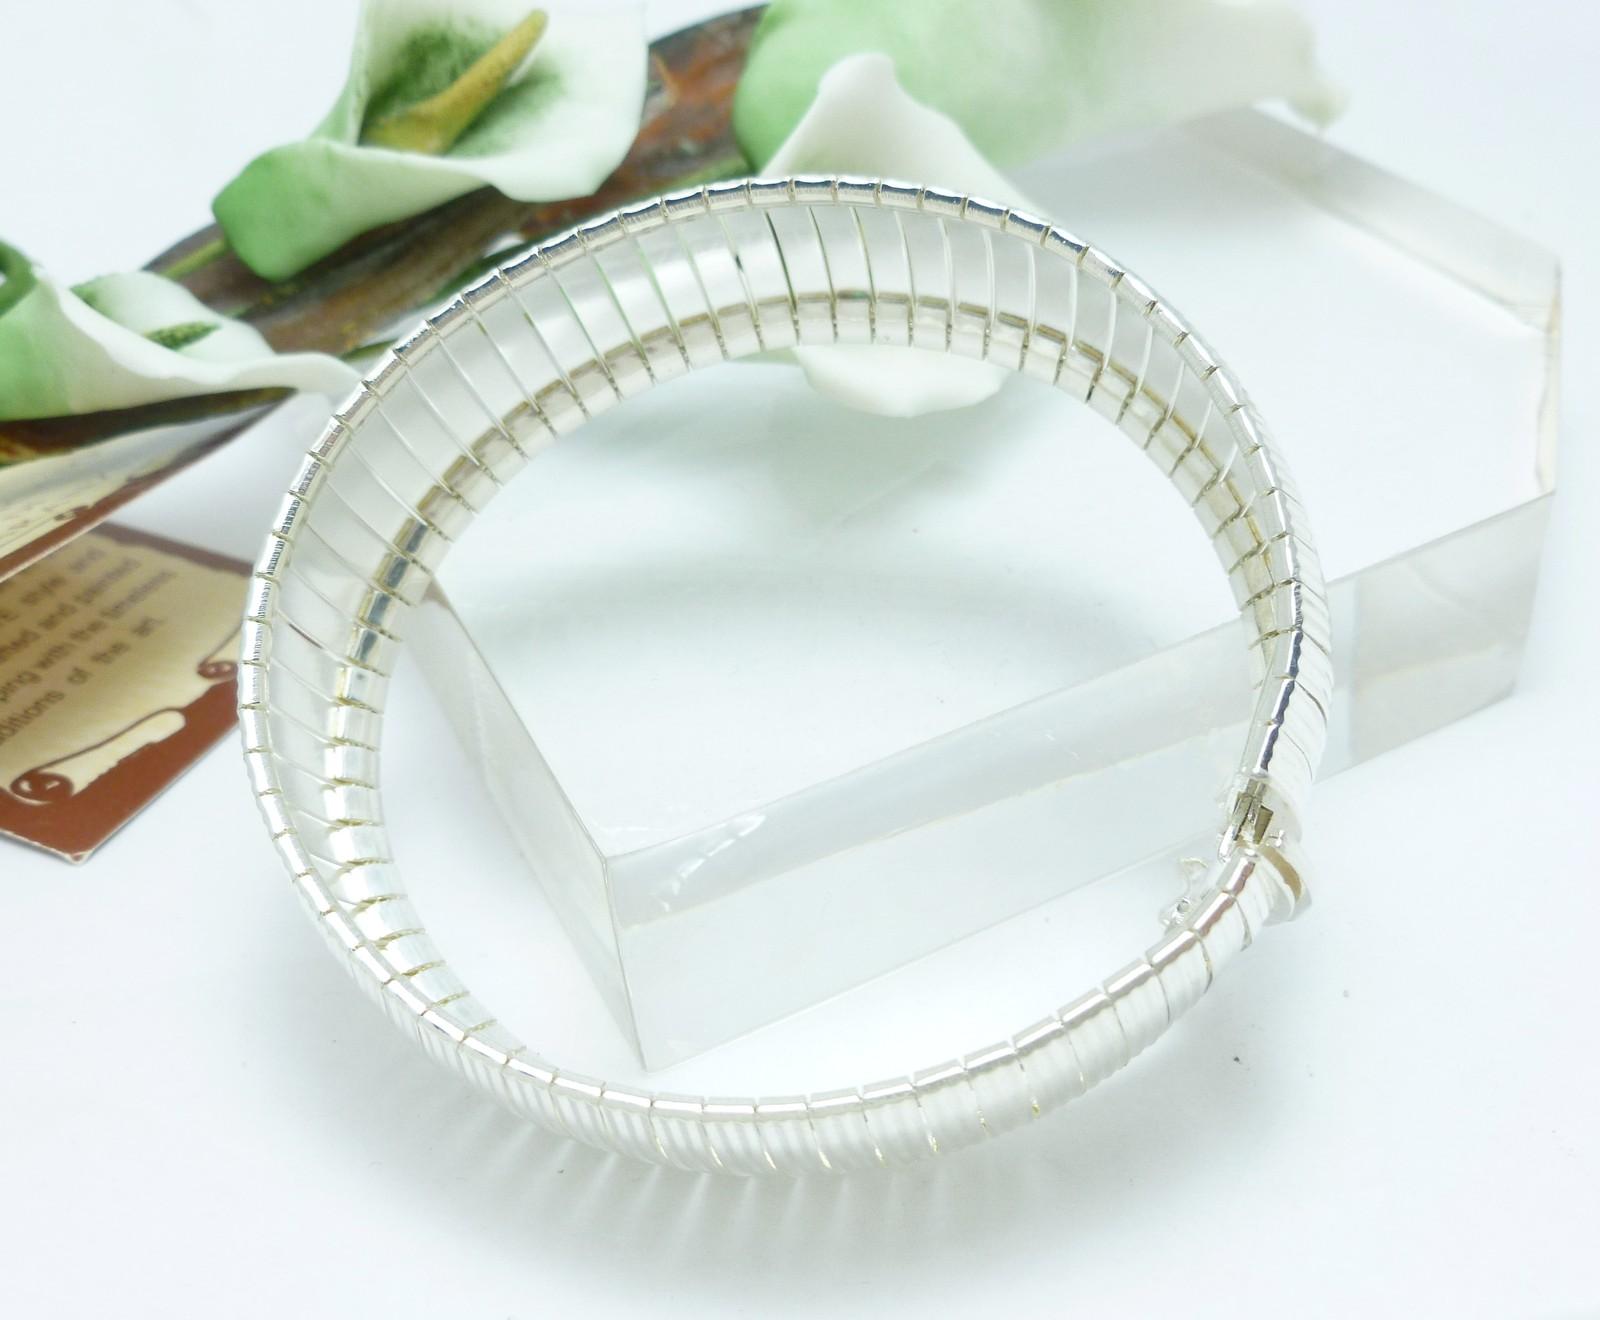 Sterling Diamond Cut Flexible Bangle Bracelet Average Wrist Size 7.25 inch